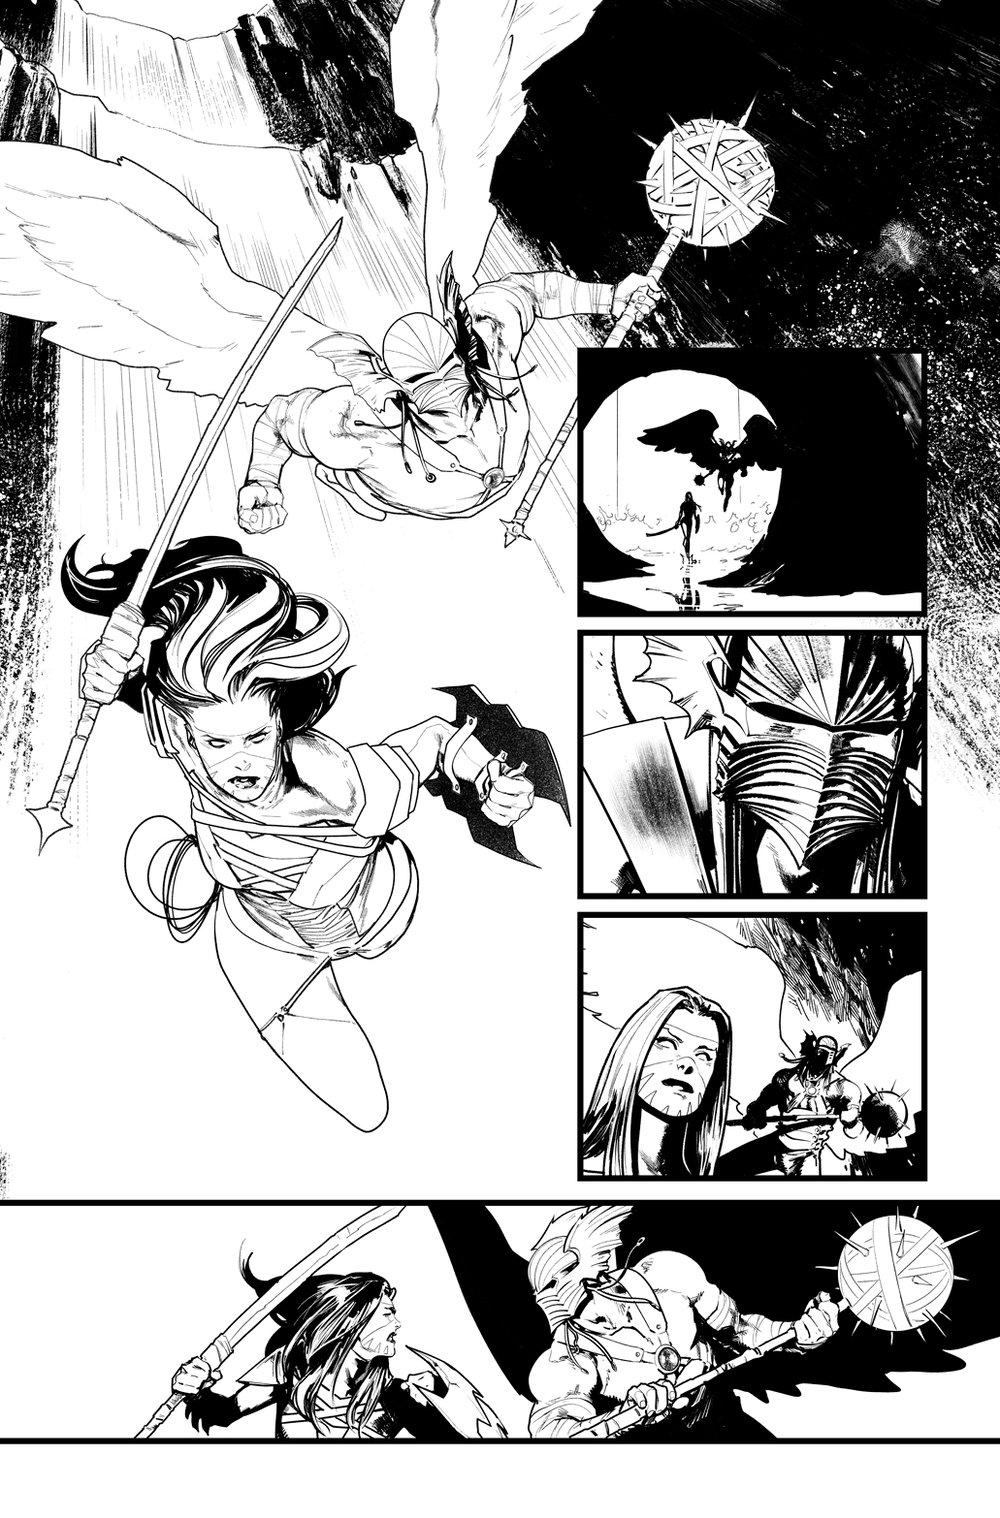 Image of BATMAN/SUPERMAN #4 p.11 ARTIST'S PROOF